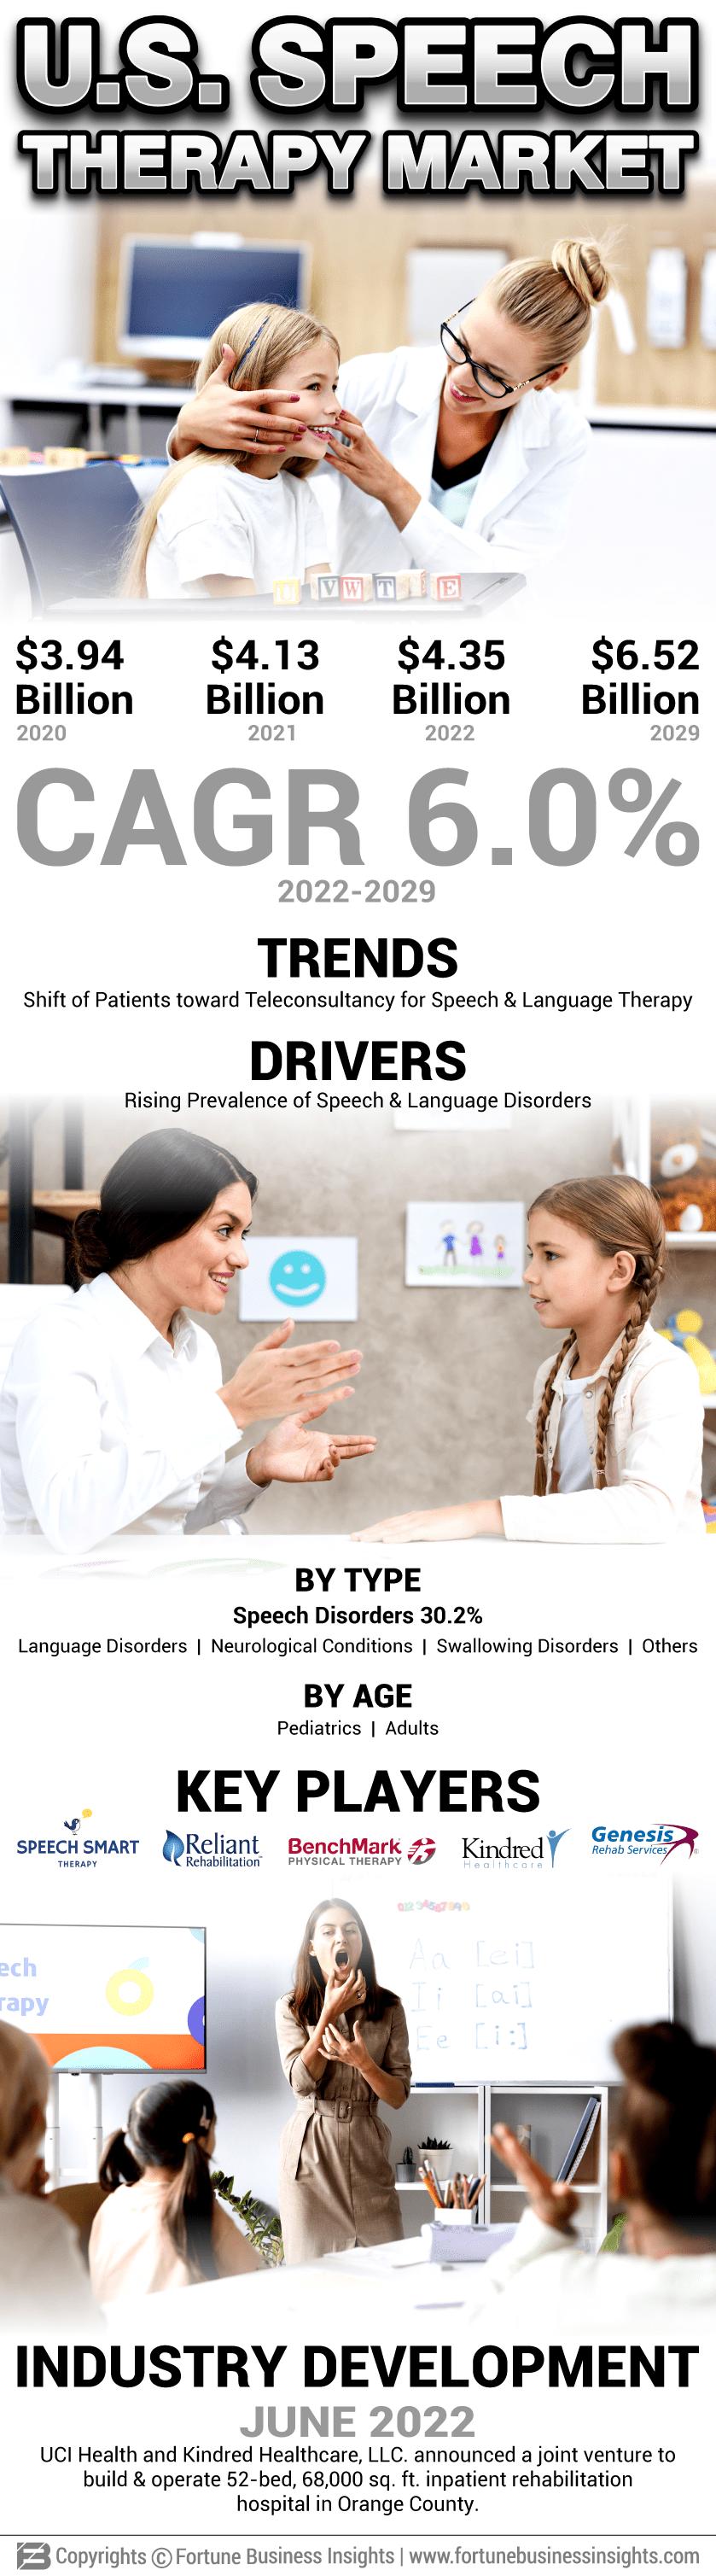 U.S. Speech Therapy Market